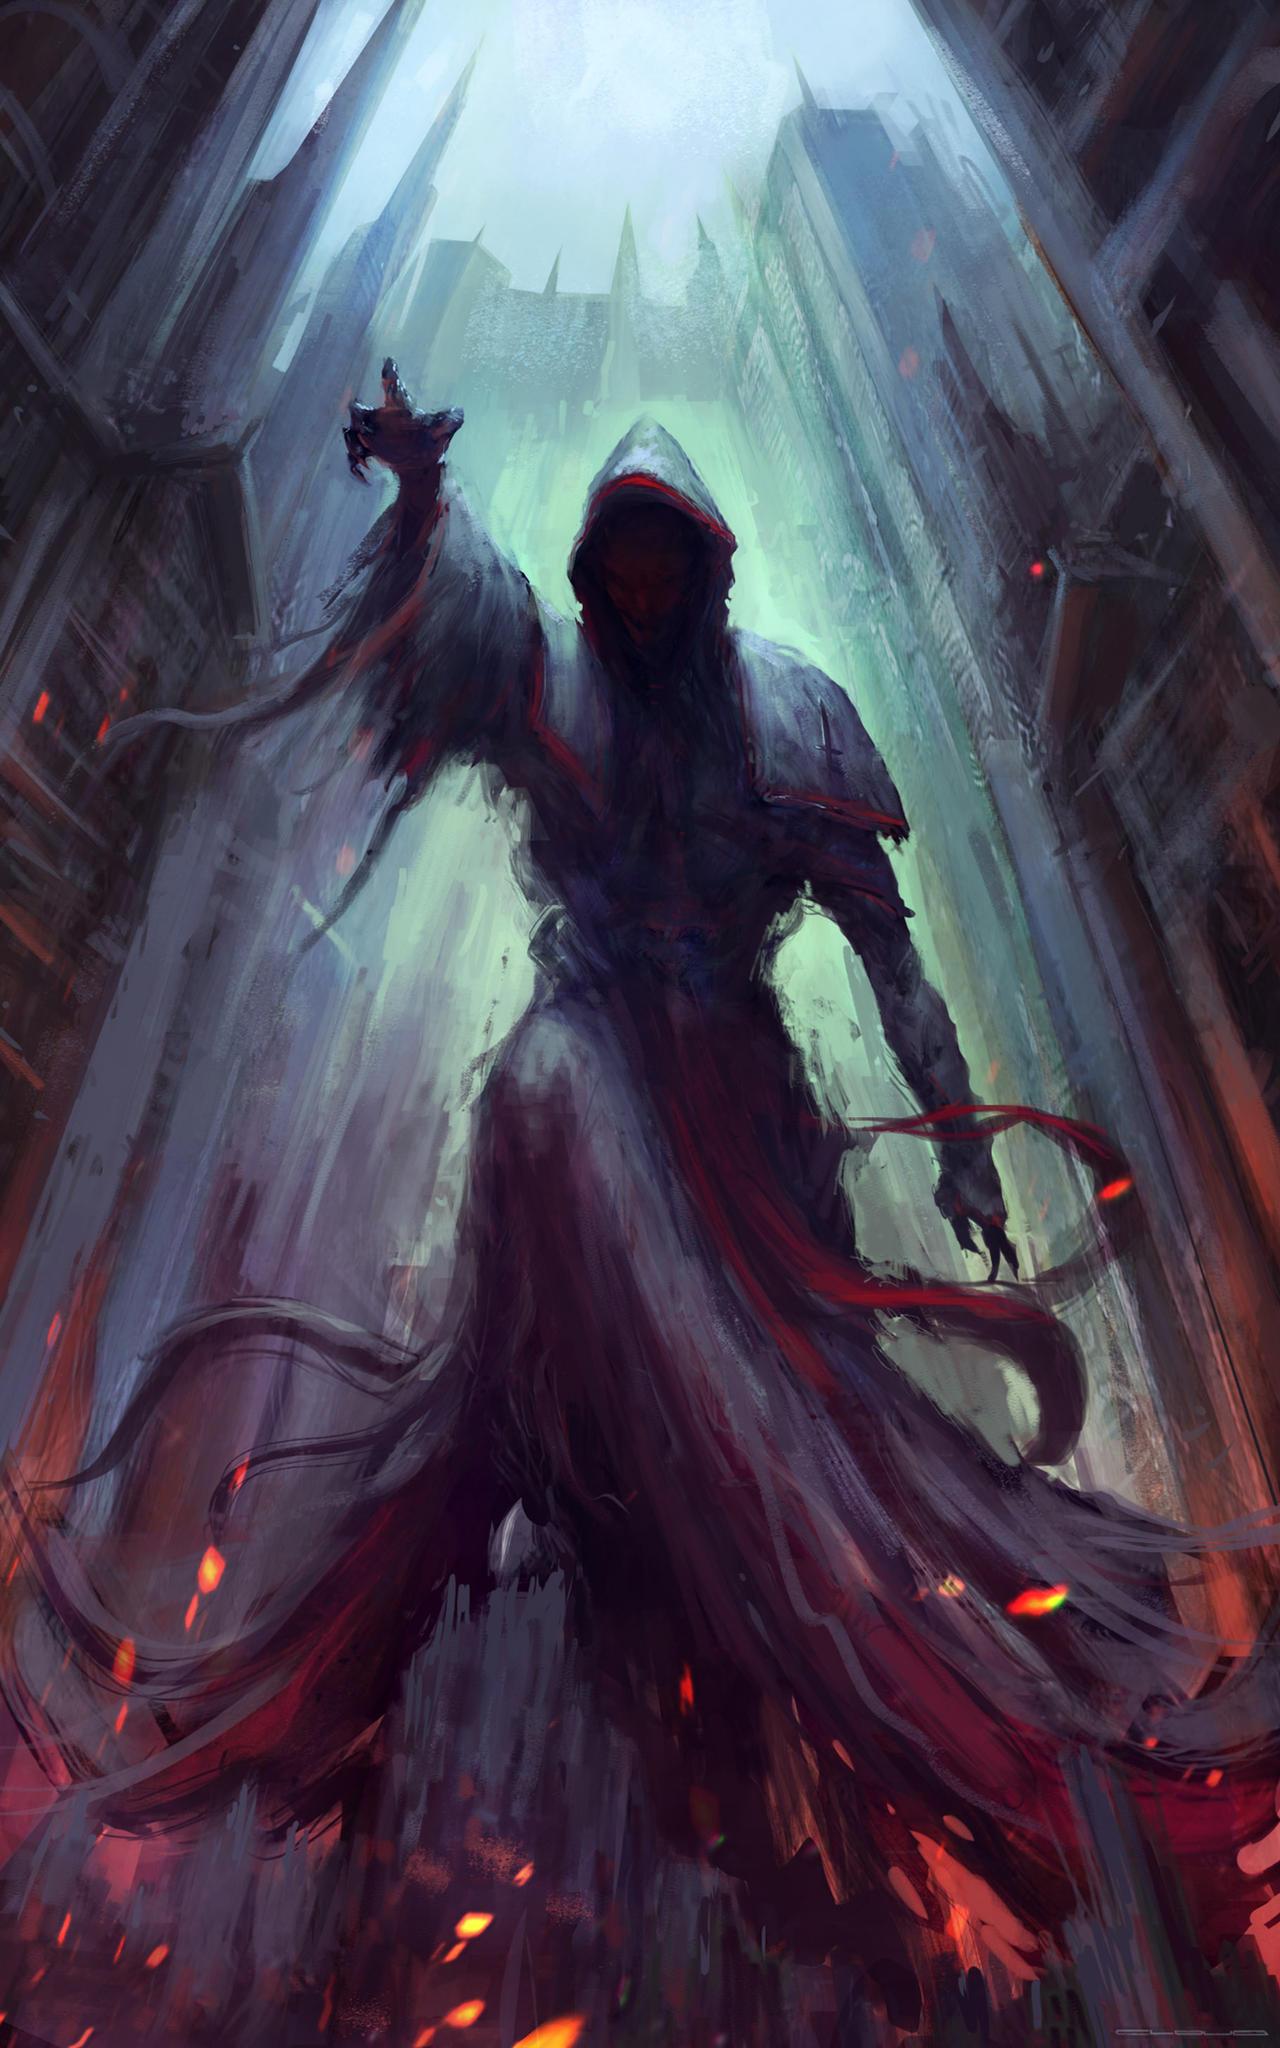 Dark priest